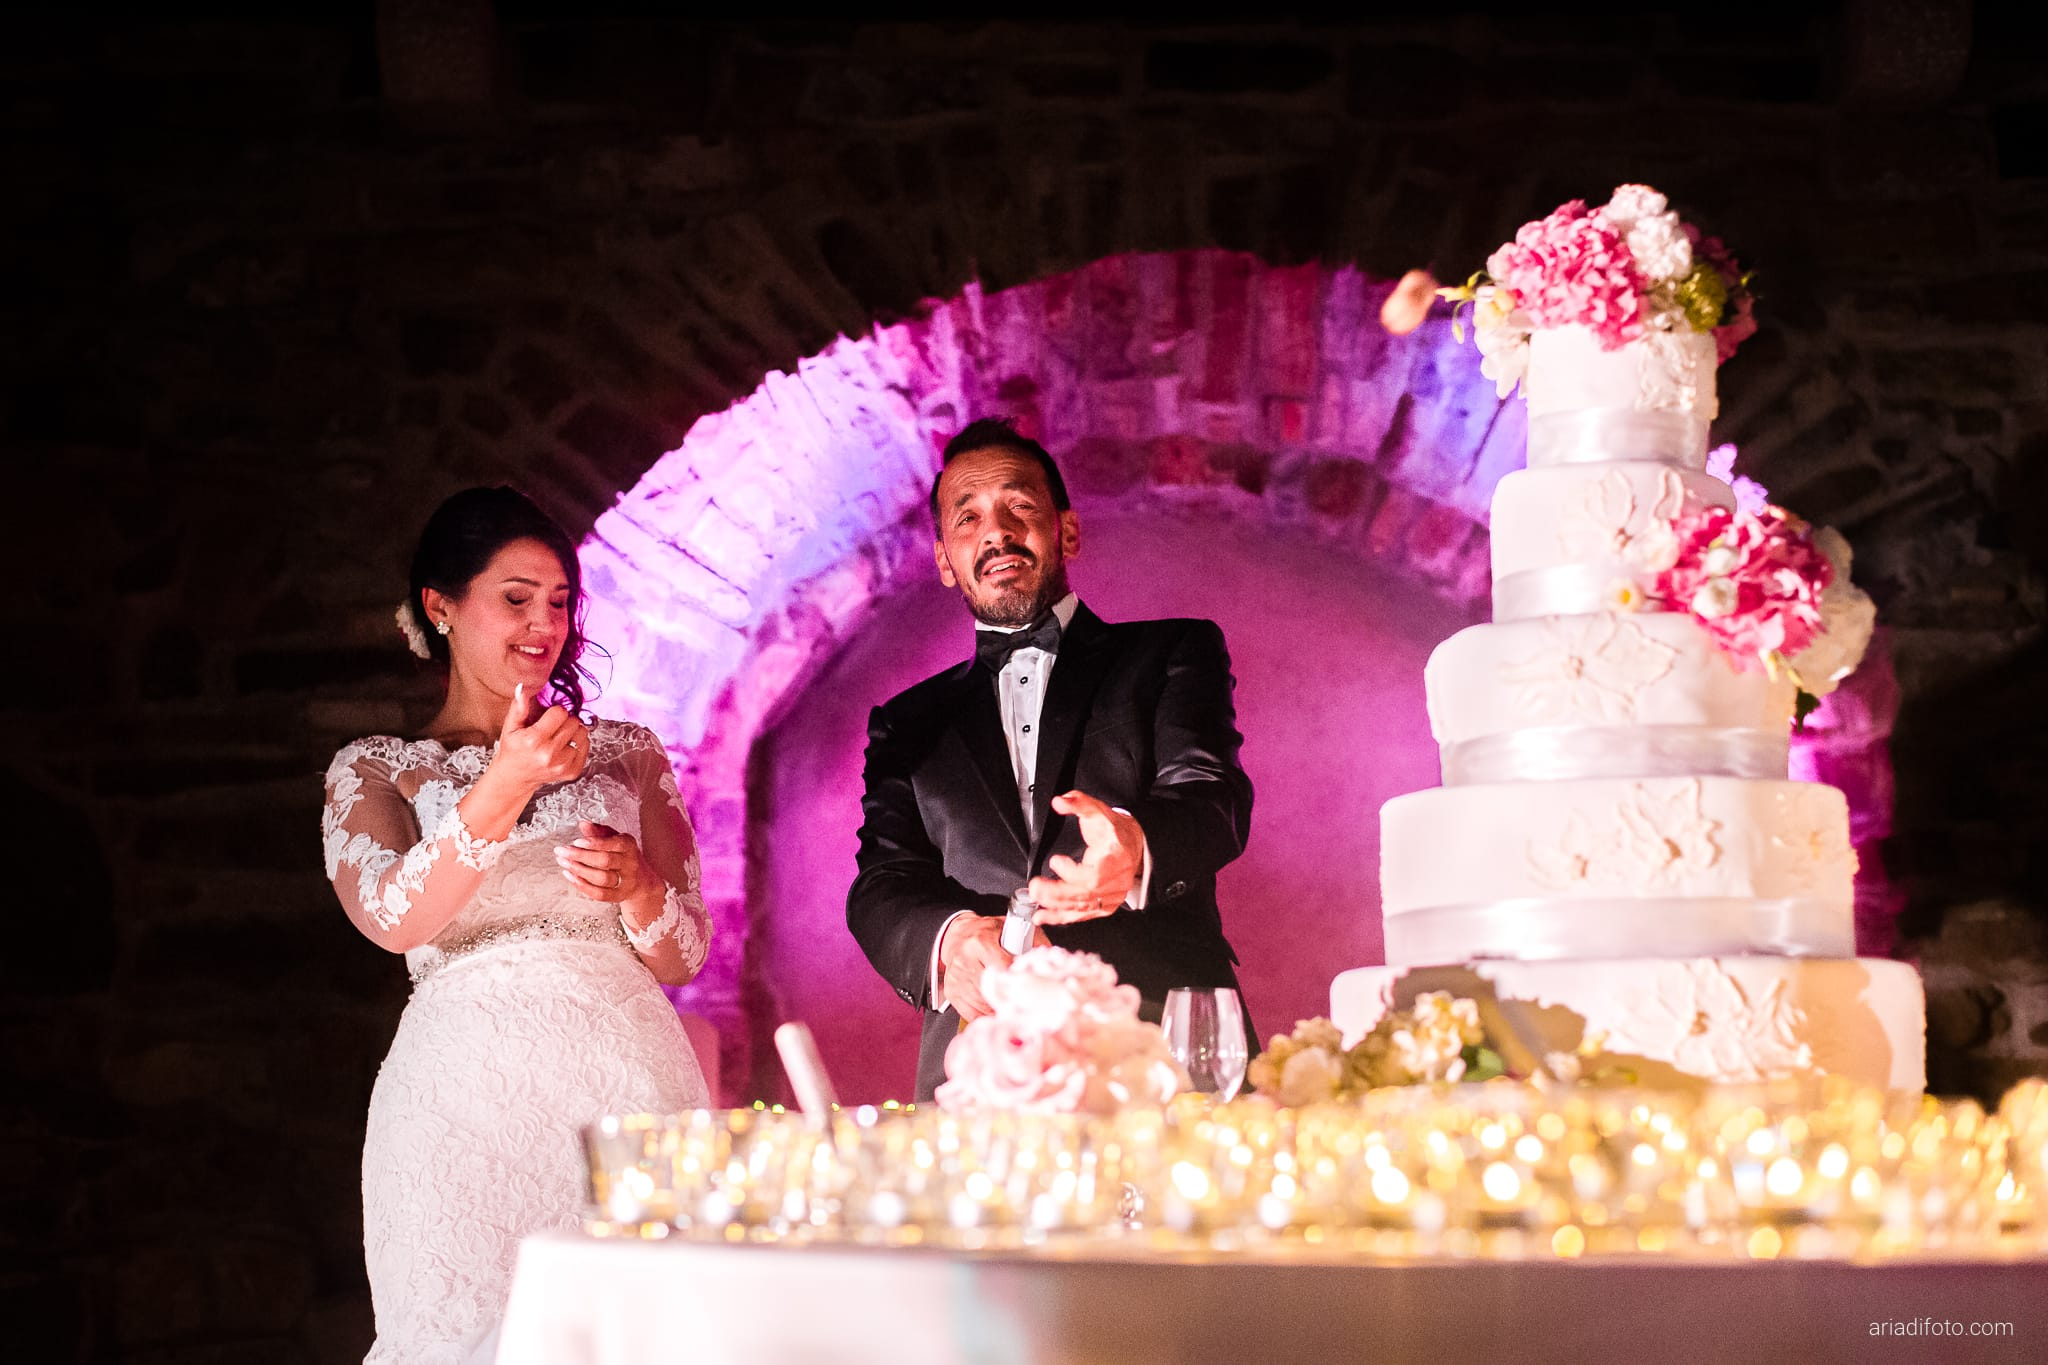 Sofia Mario Matrimonio Baronesse Tacco Collio Gorizia ricevimento torta